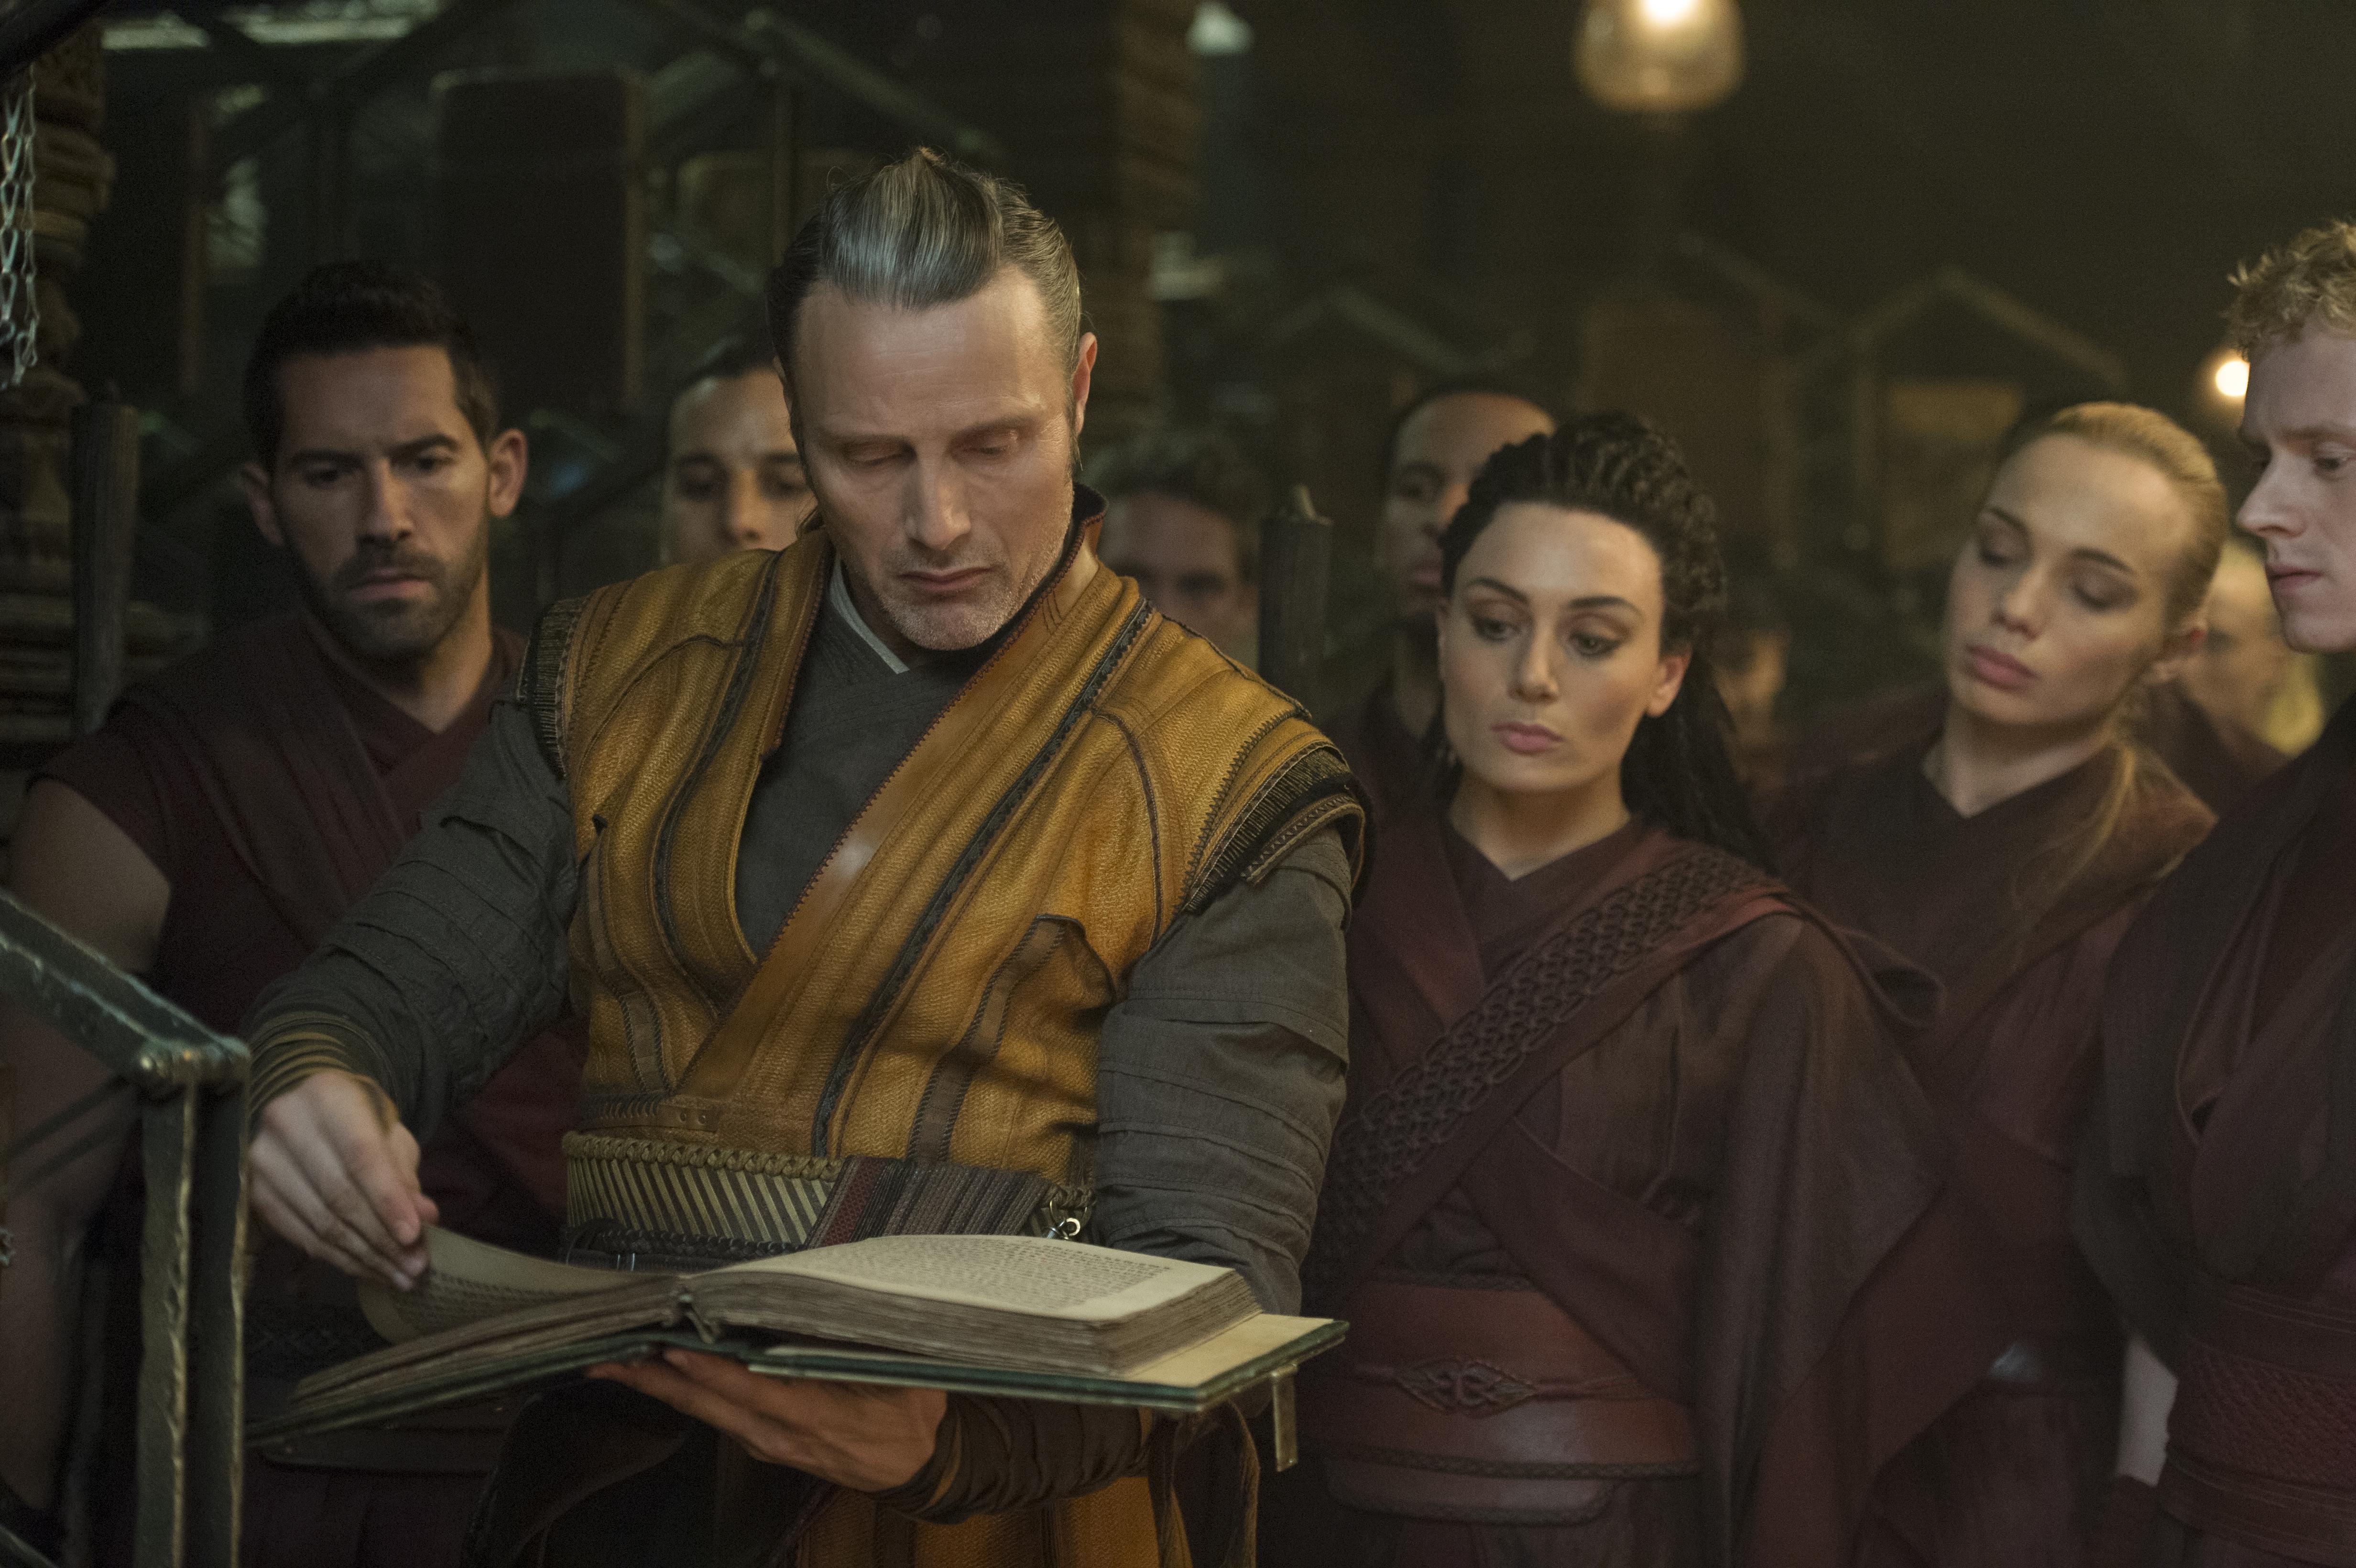 Mads Mikkelsen making reading more awesome, also in Doctor Strange